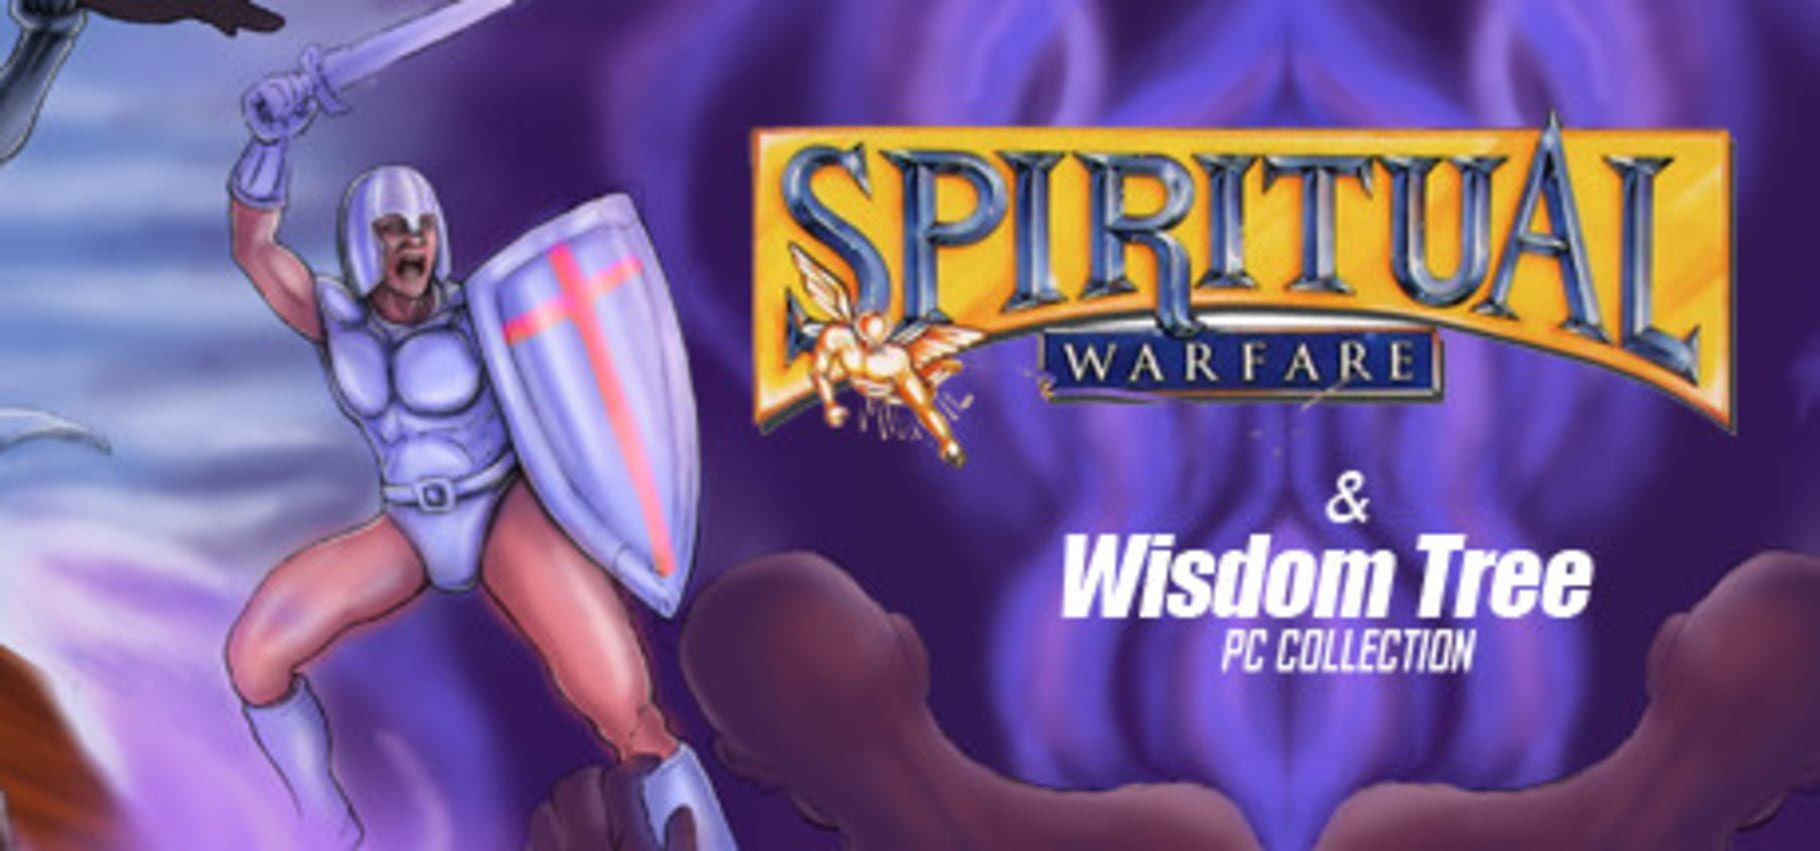 buy Spiritual Warfare & Wisdom Tree Collection cd key for all platform